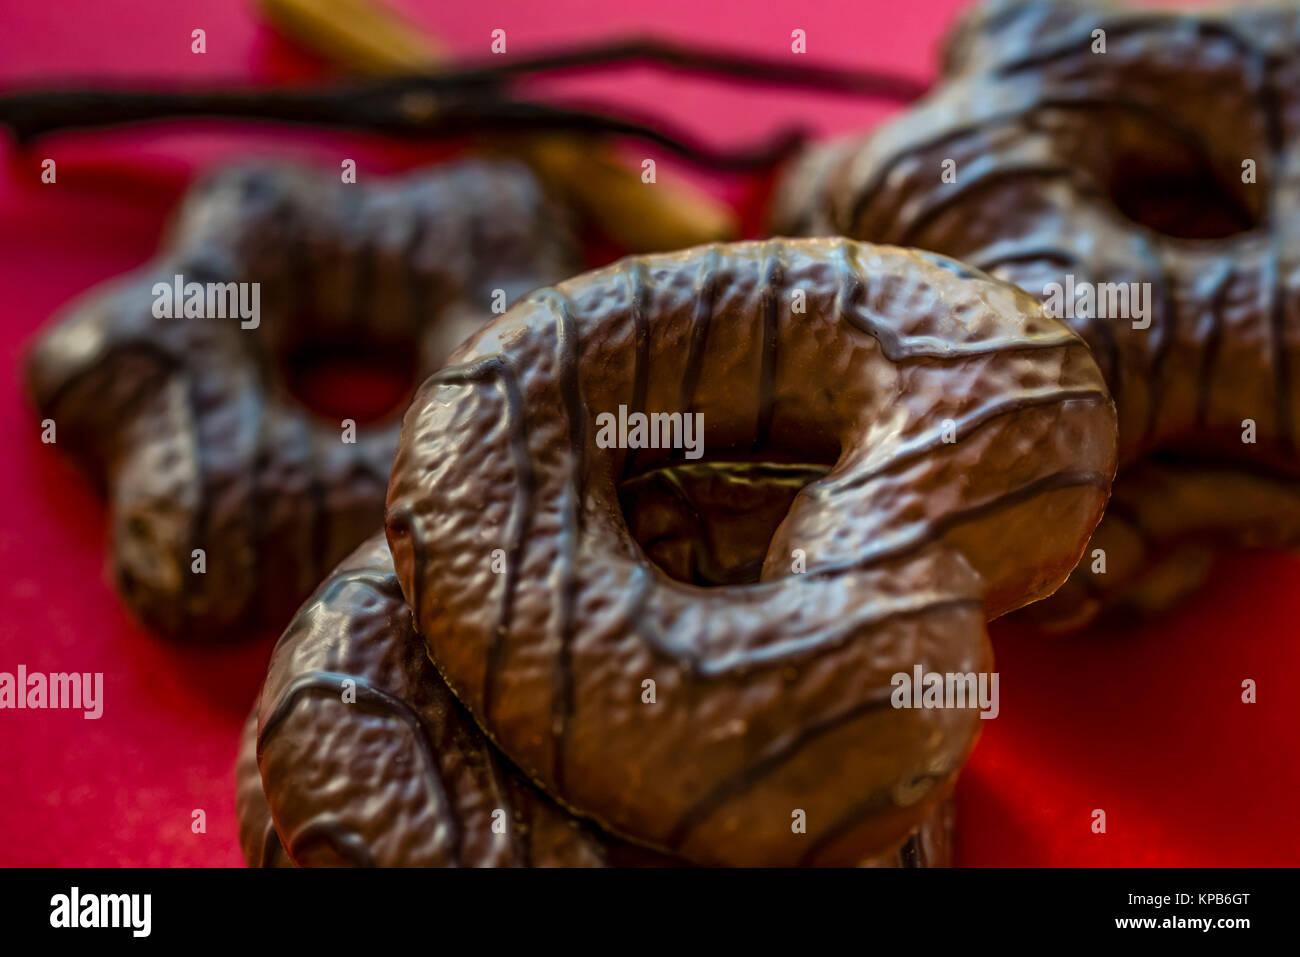 German Chocolate Covered Gingerbread Cookies